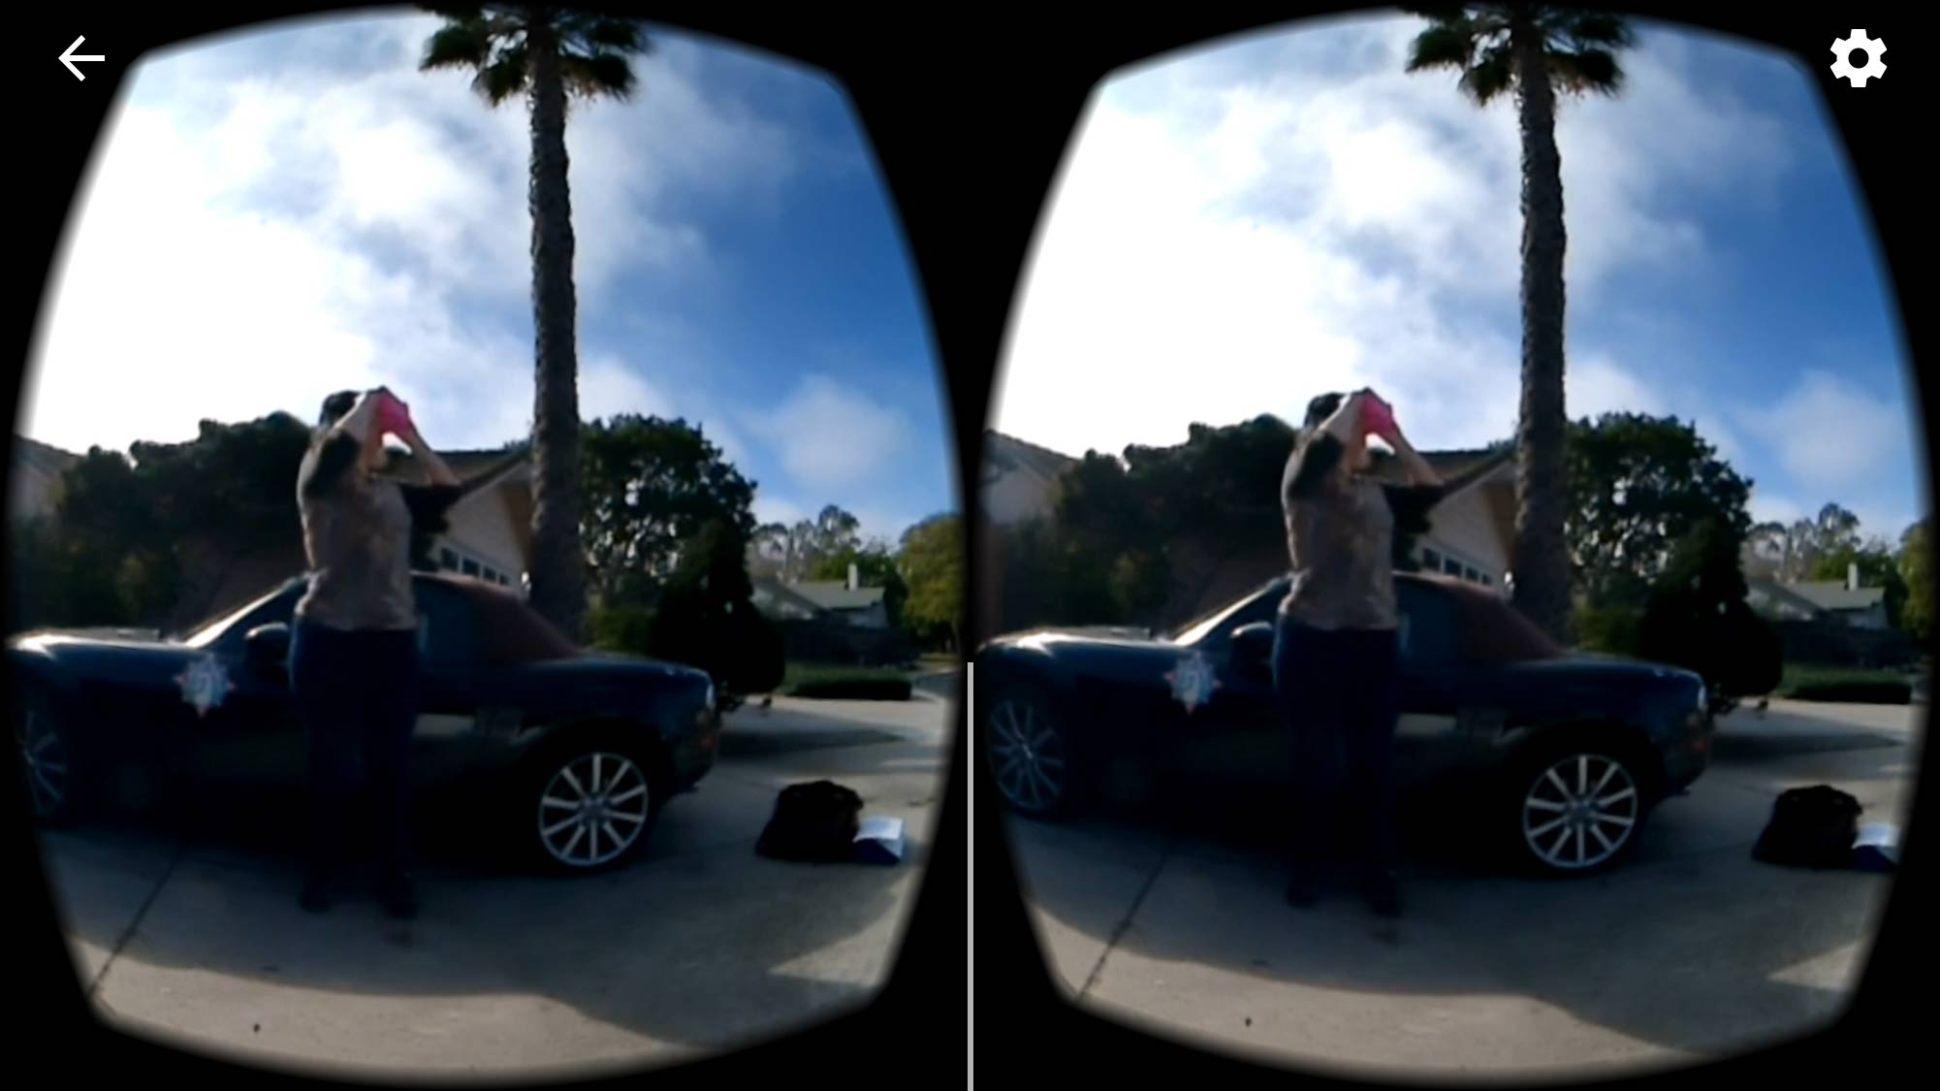 360-video-vr-view-screenshot.jpg